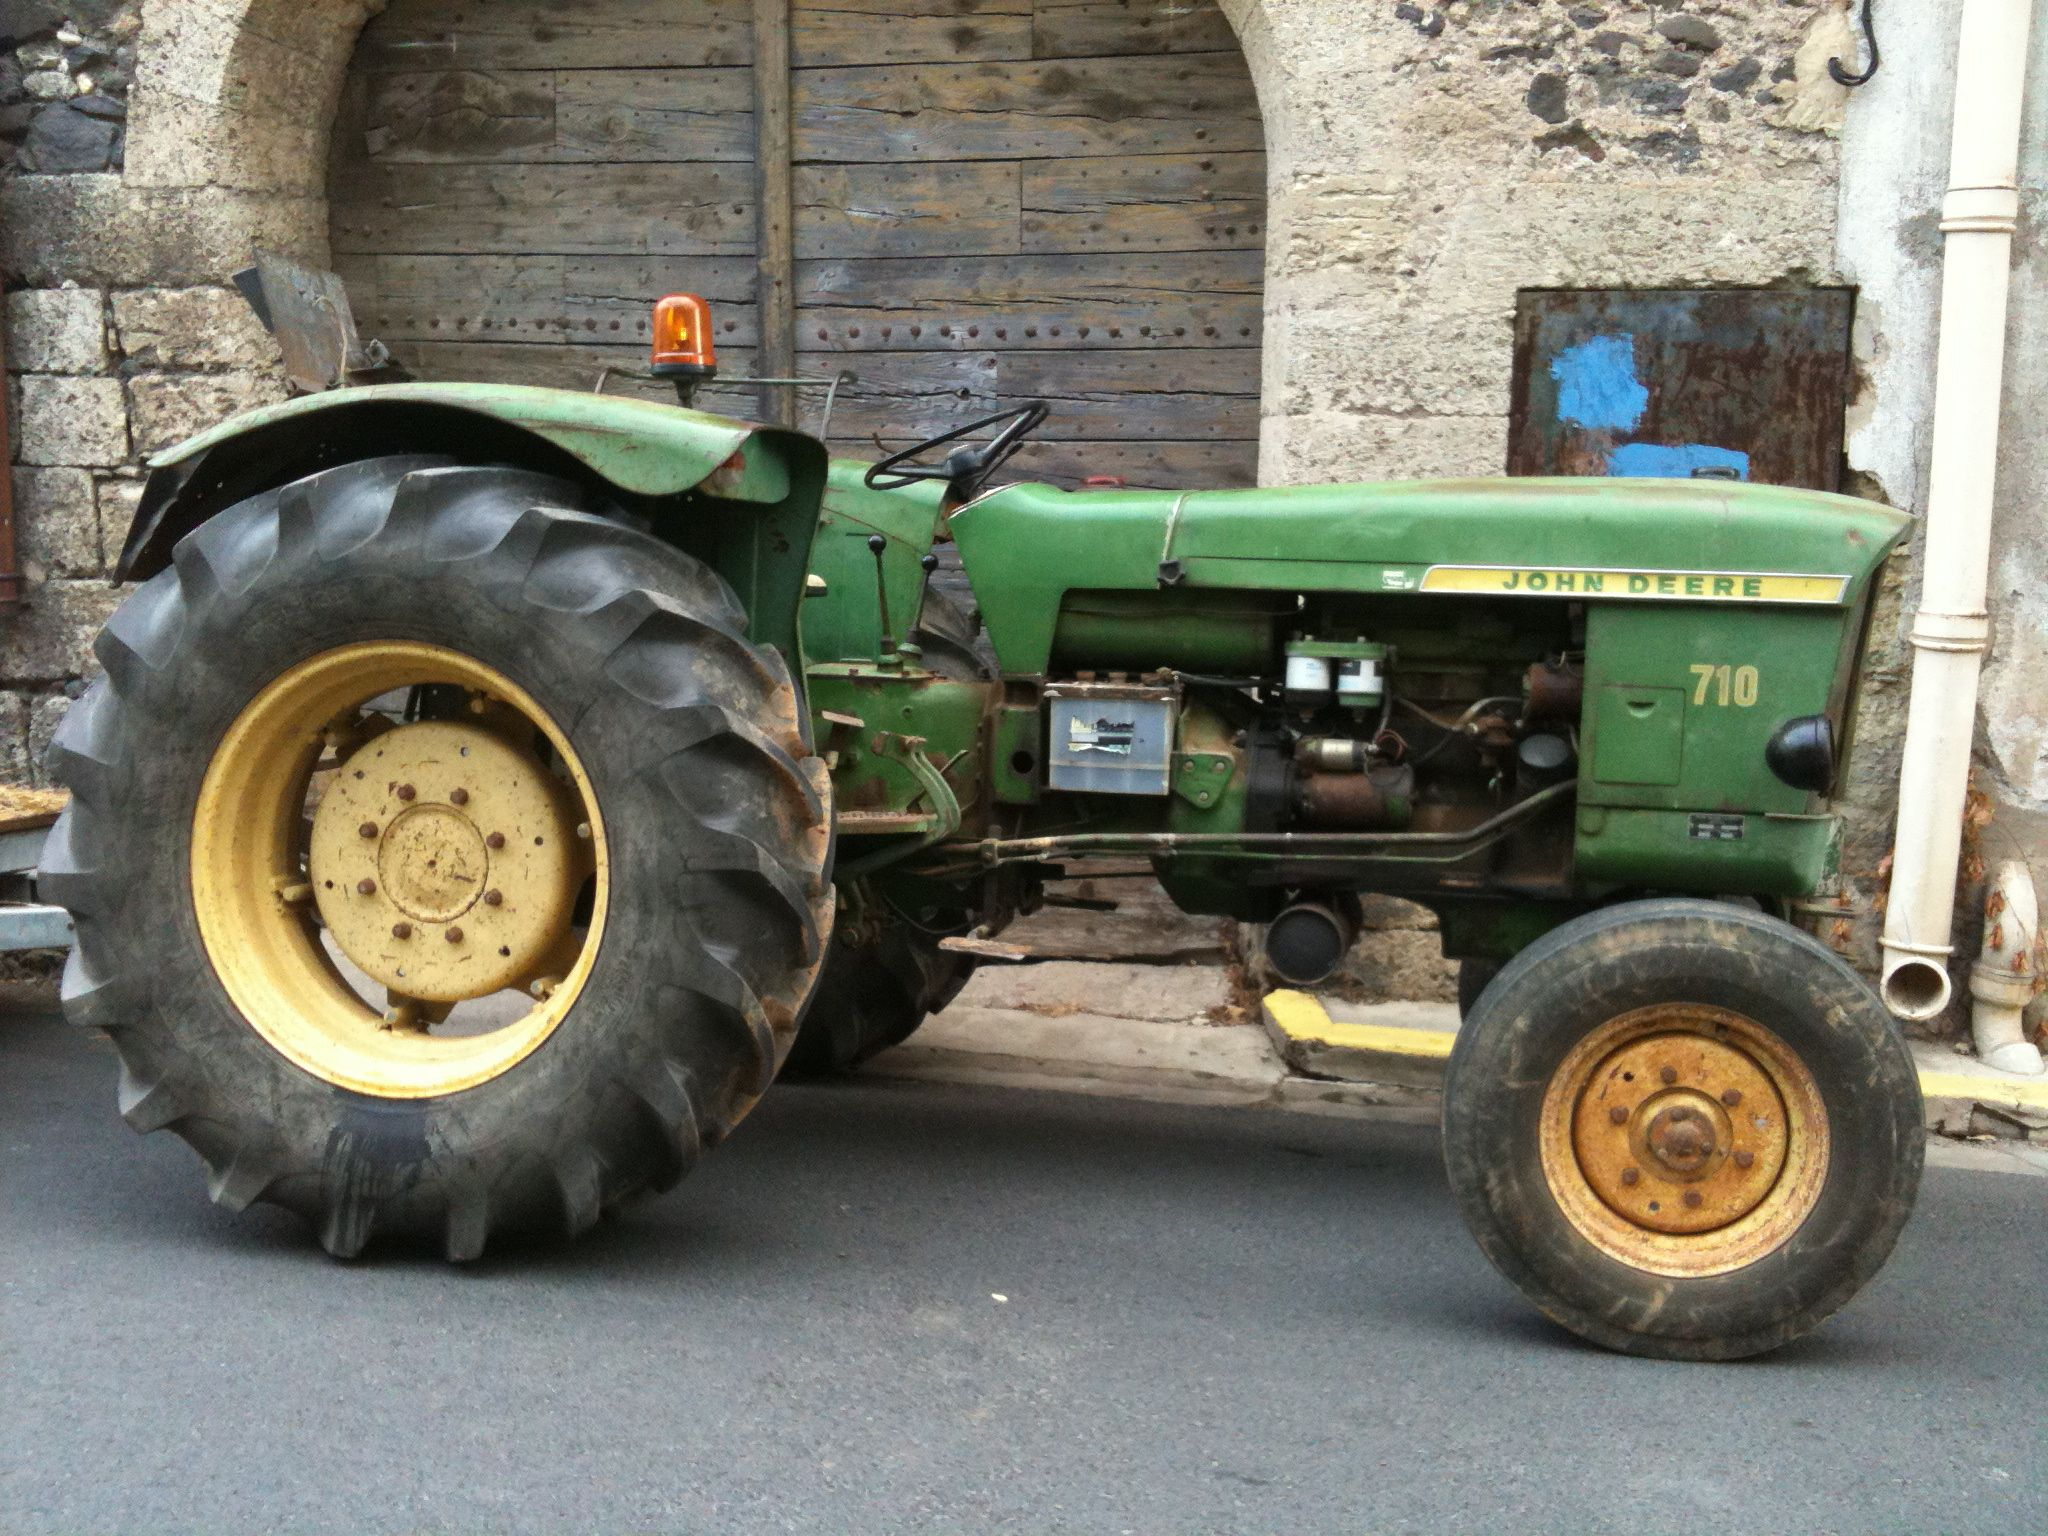 710 john deere 1960's - Google Search Vintage Tractors, John Deere Tractors,  Tractor,